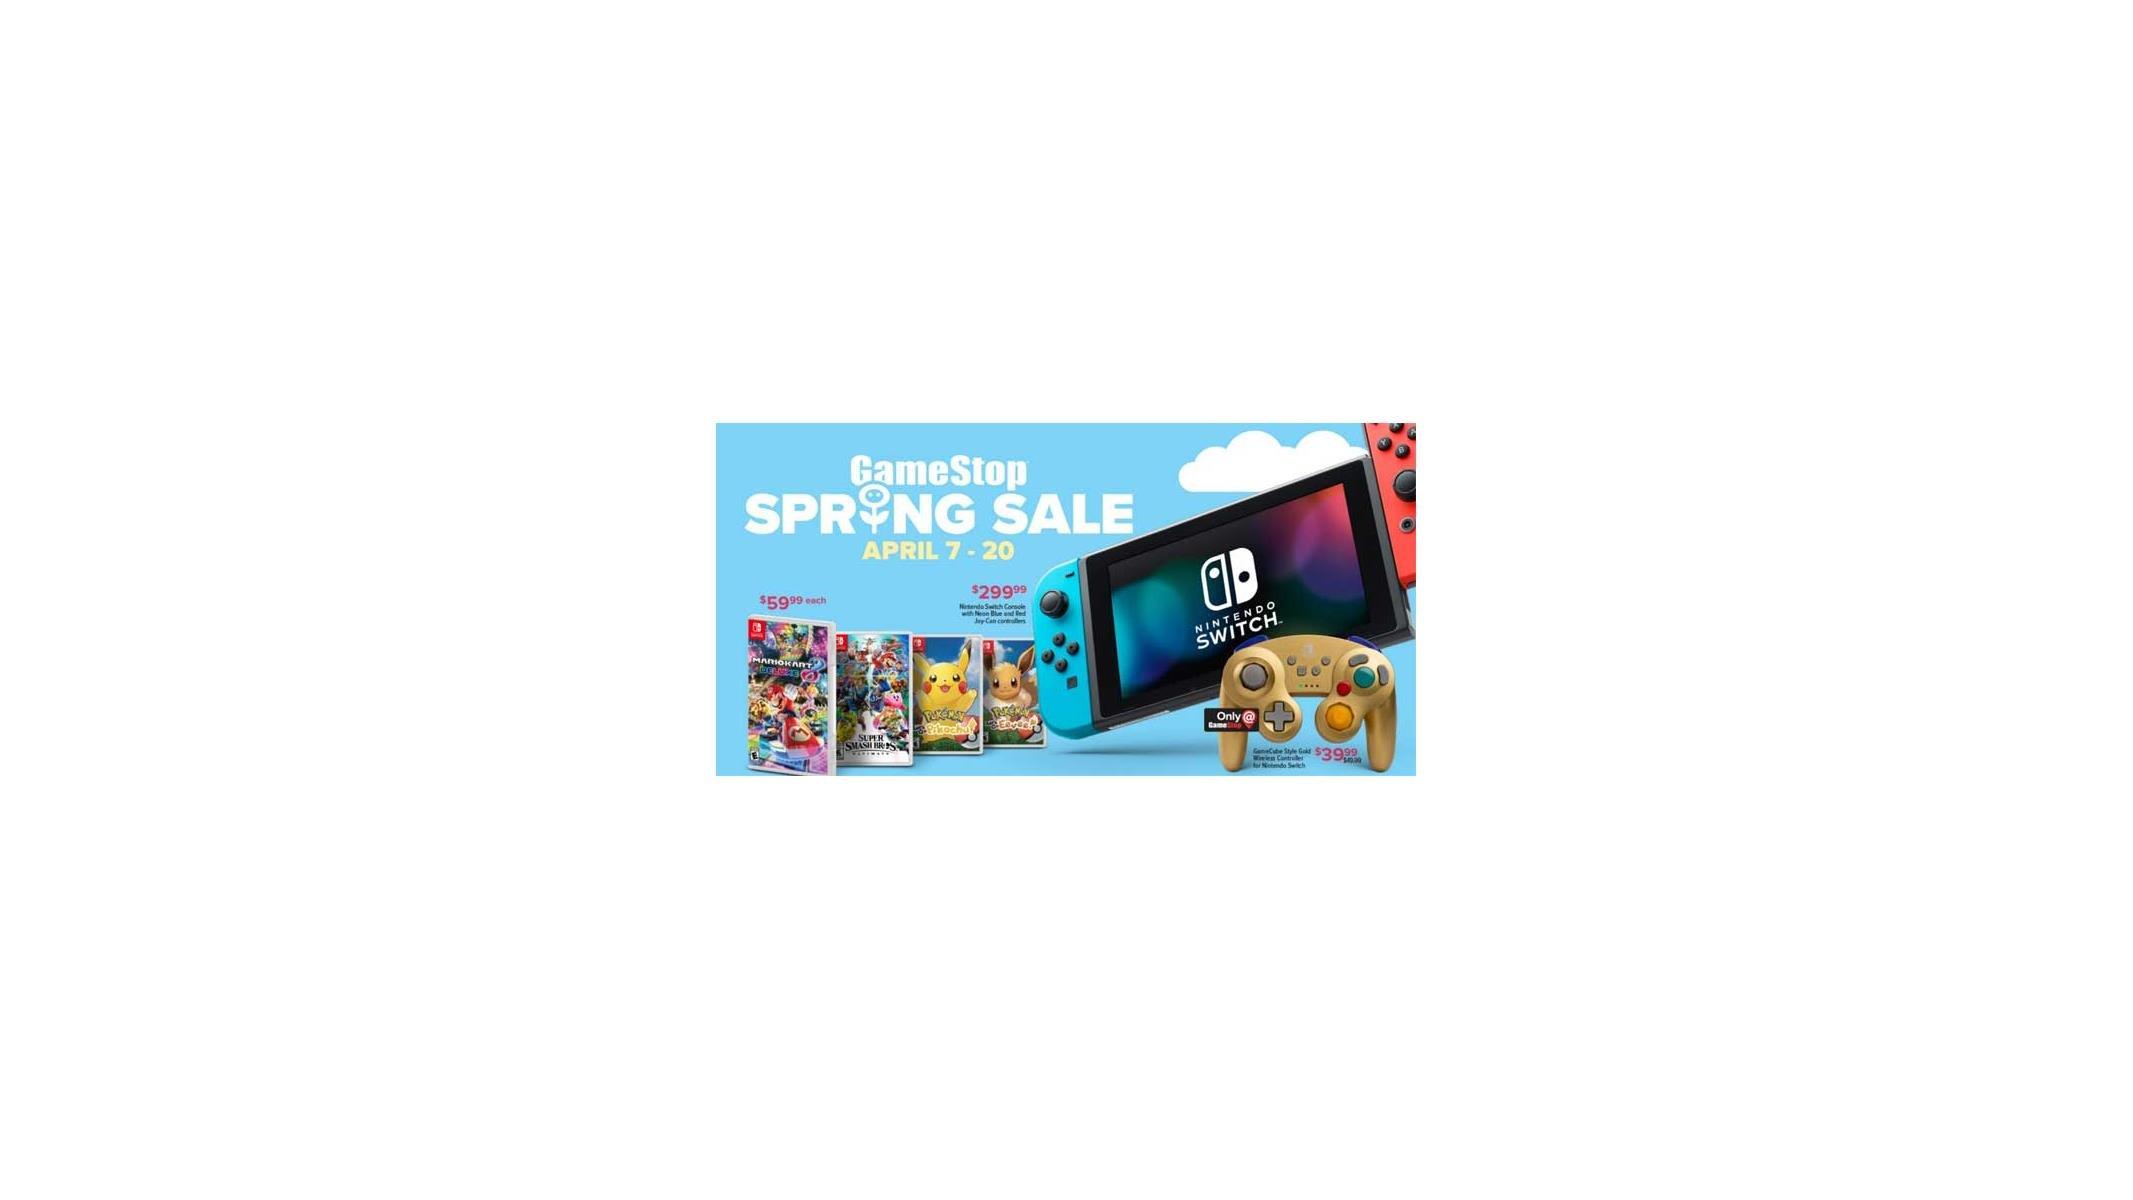 nba 2k19 20th anniversary edition gamestop